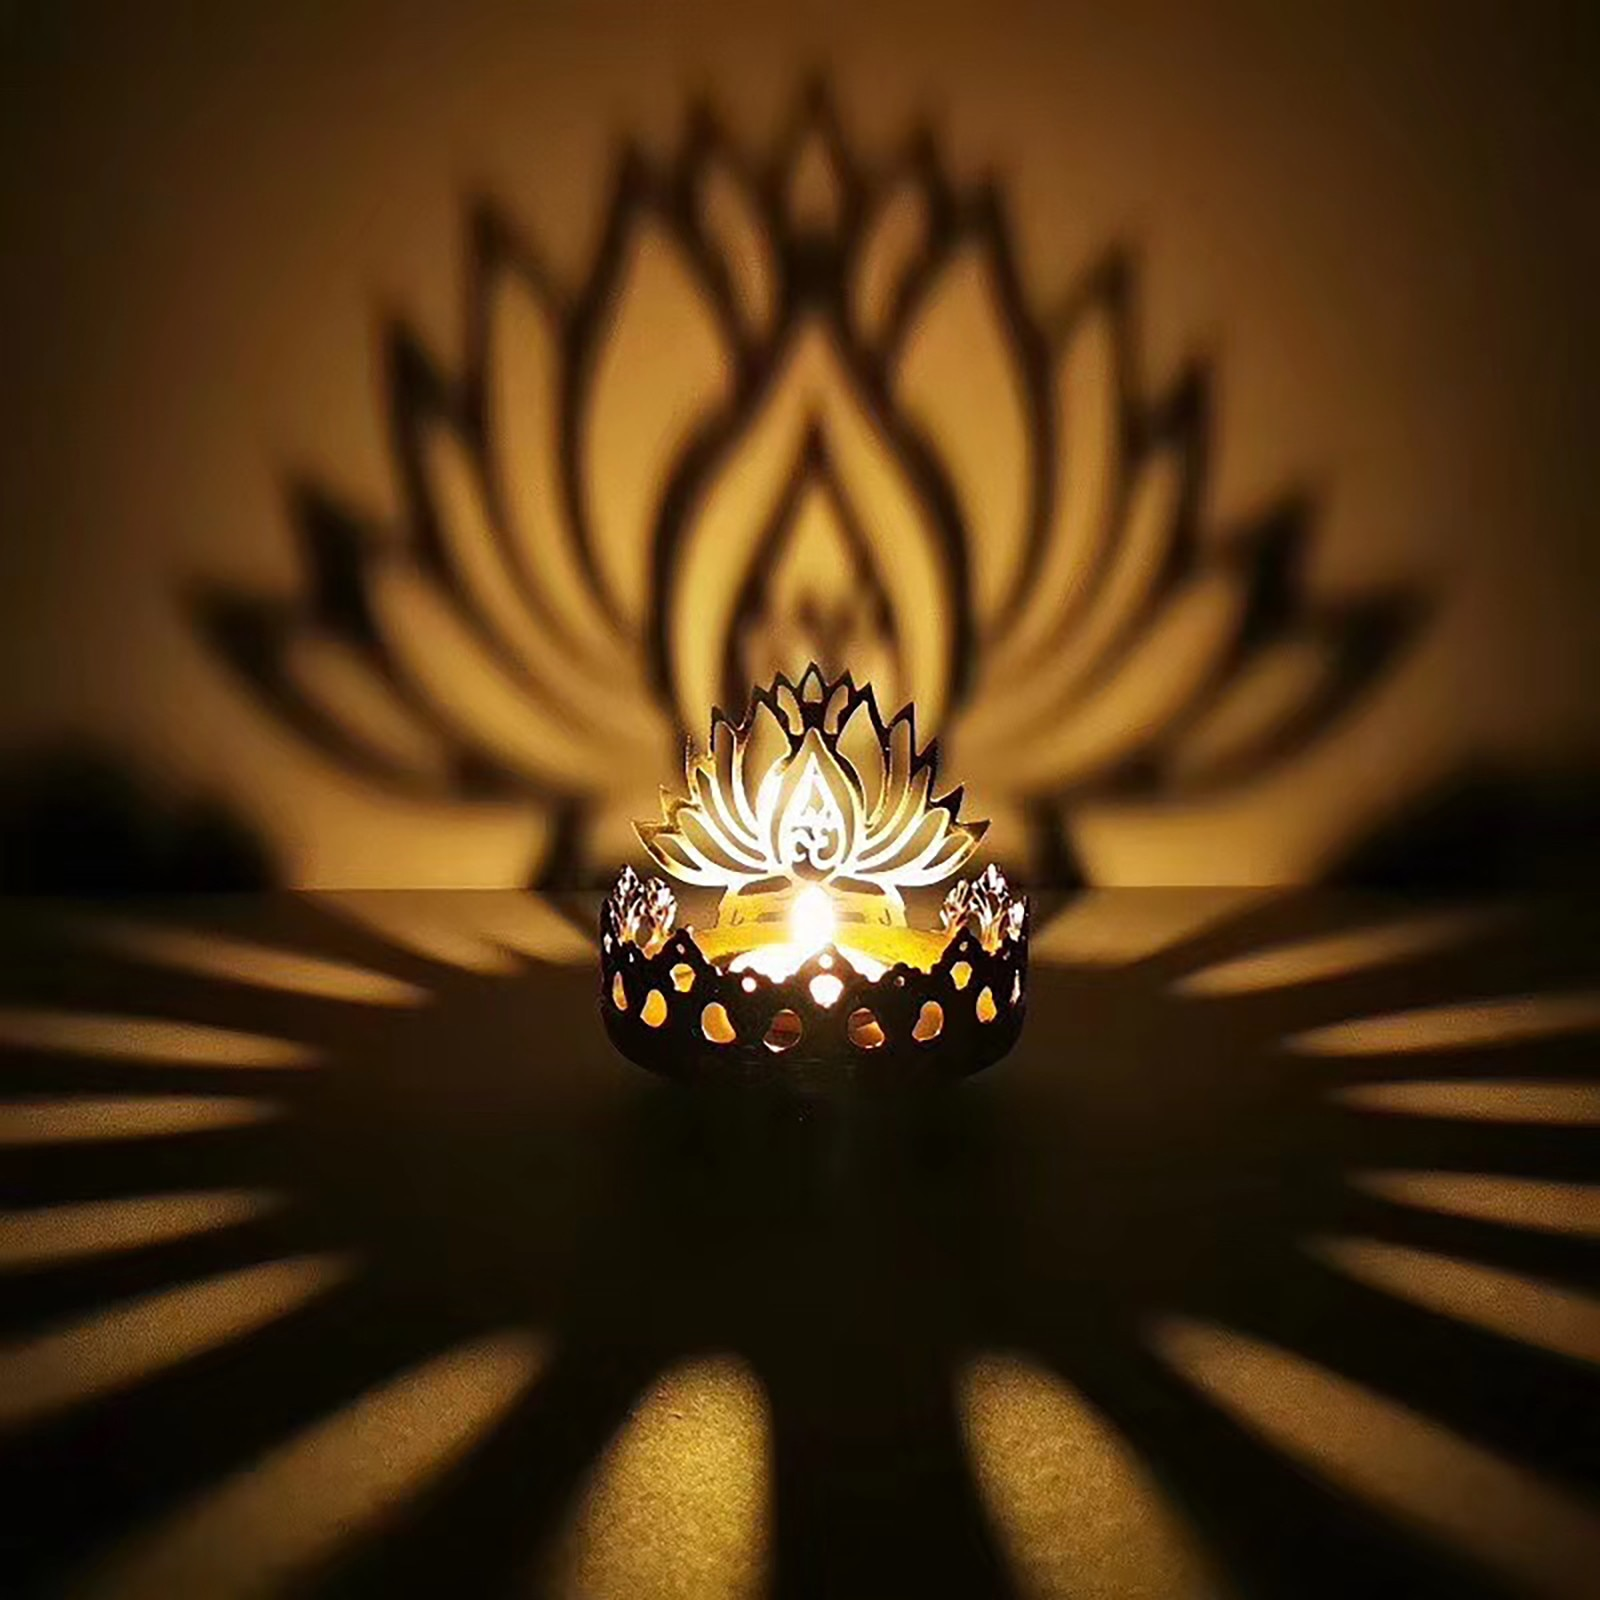 Lotus-Buddha-Hollow-Candle-Holder-Alloy-Carved-Light-Shadow-Lantern-Buddhistic-Art-Ornament-Home-Decoration-Desk.jpg